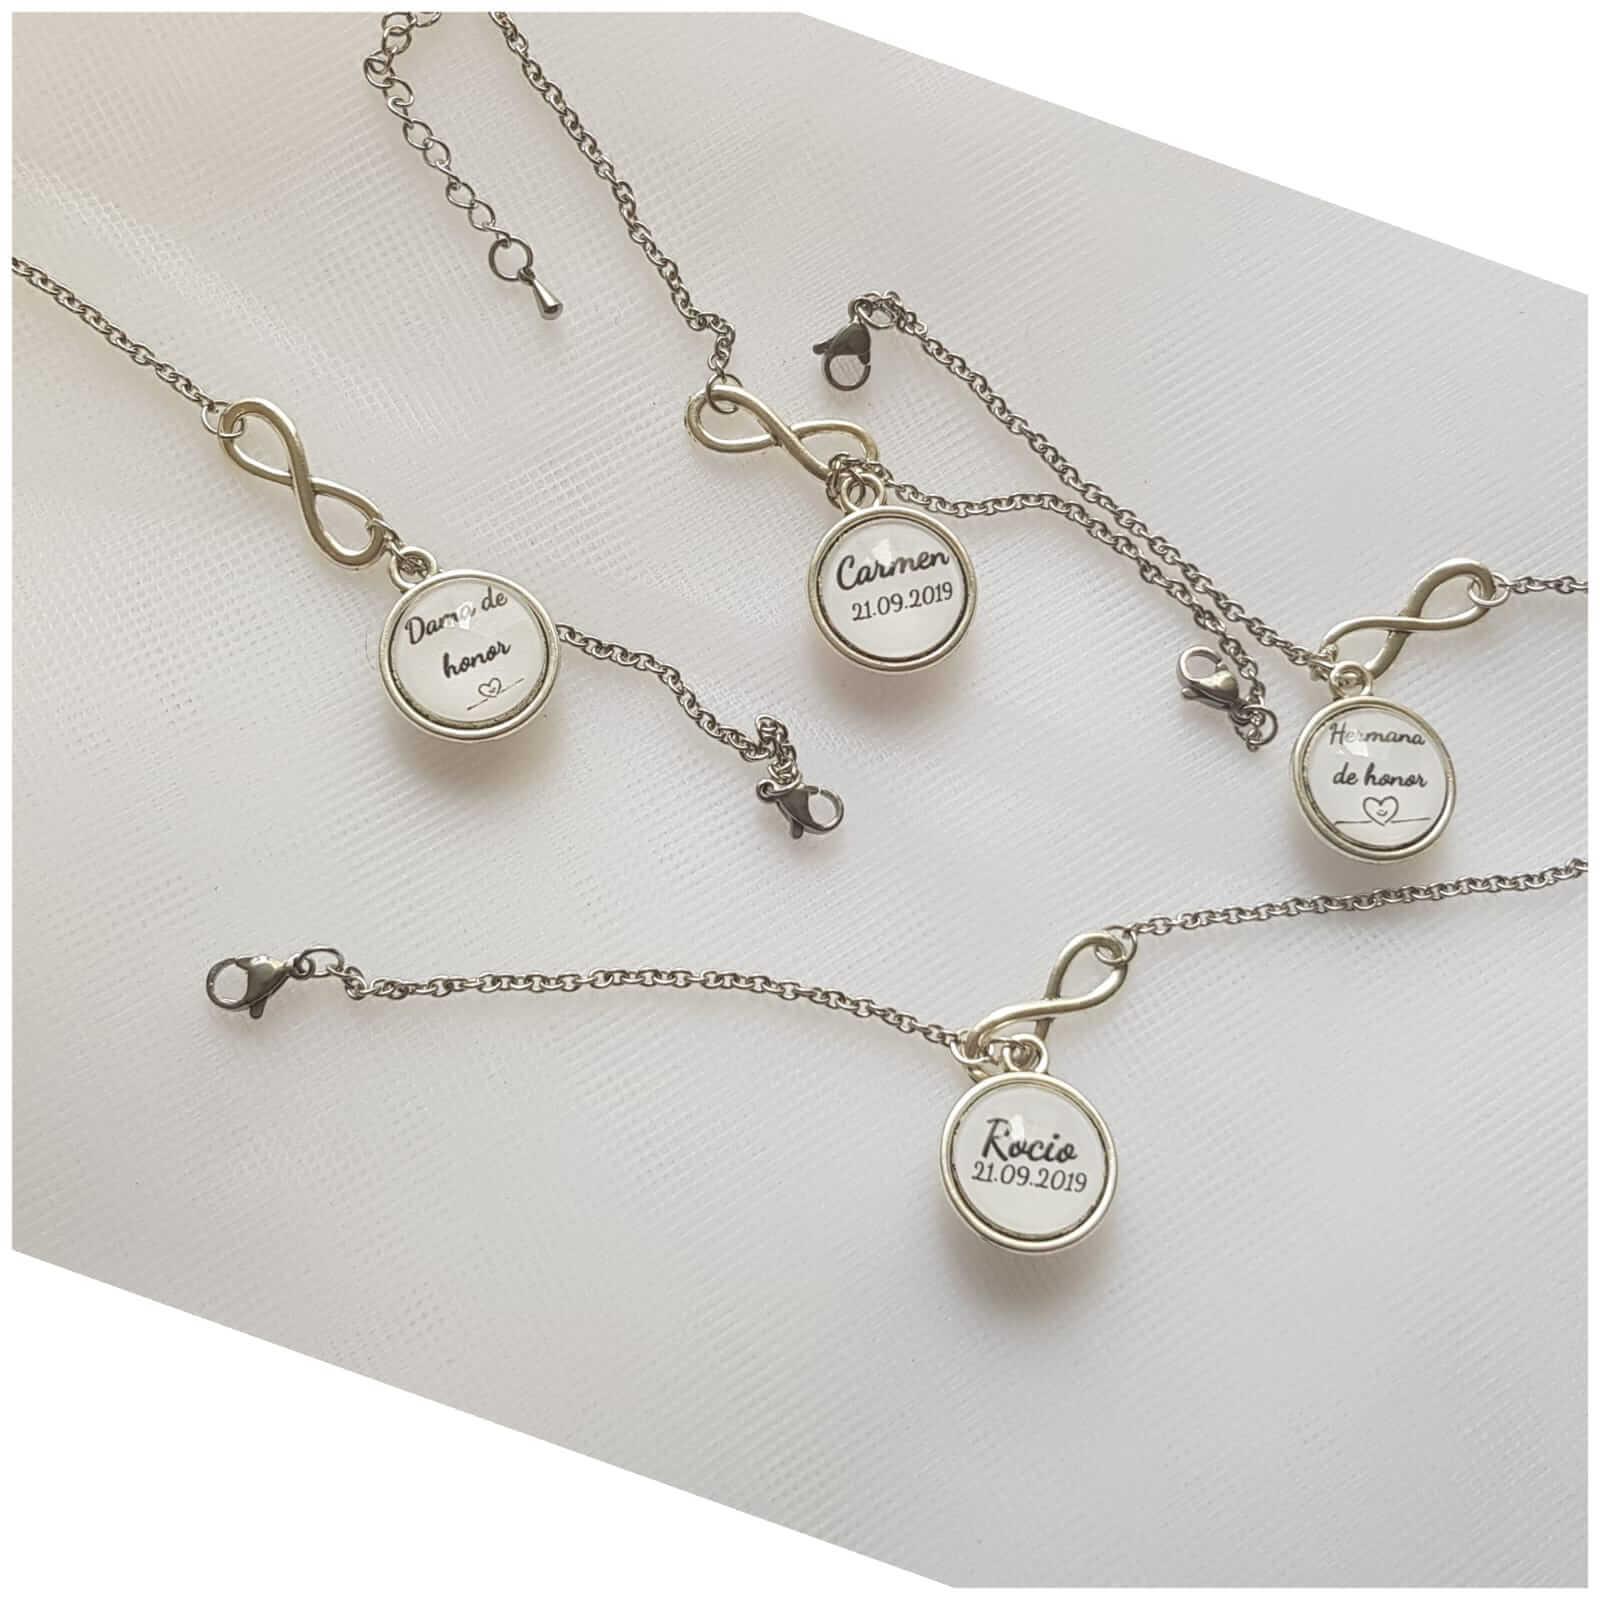 pulseras damas de honor pulseras damas de honor - pulseras damas de honor 2 - Pulseras damas de honor